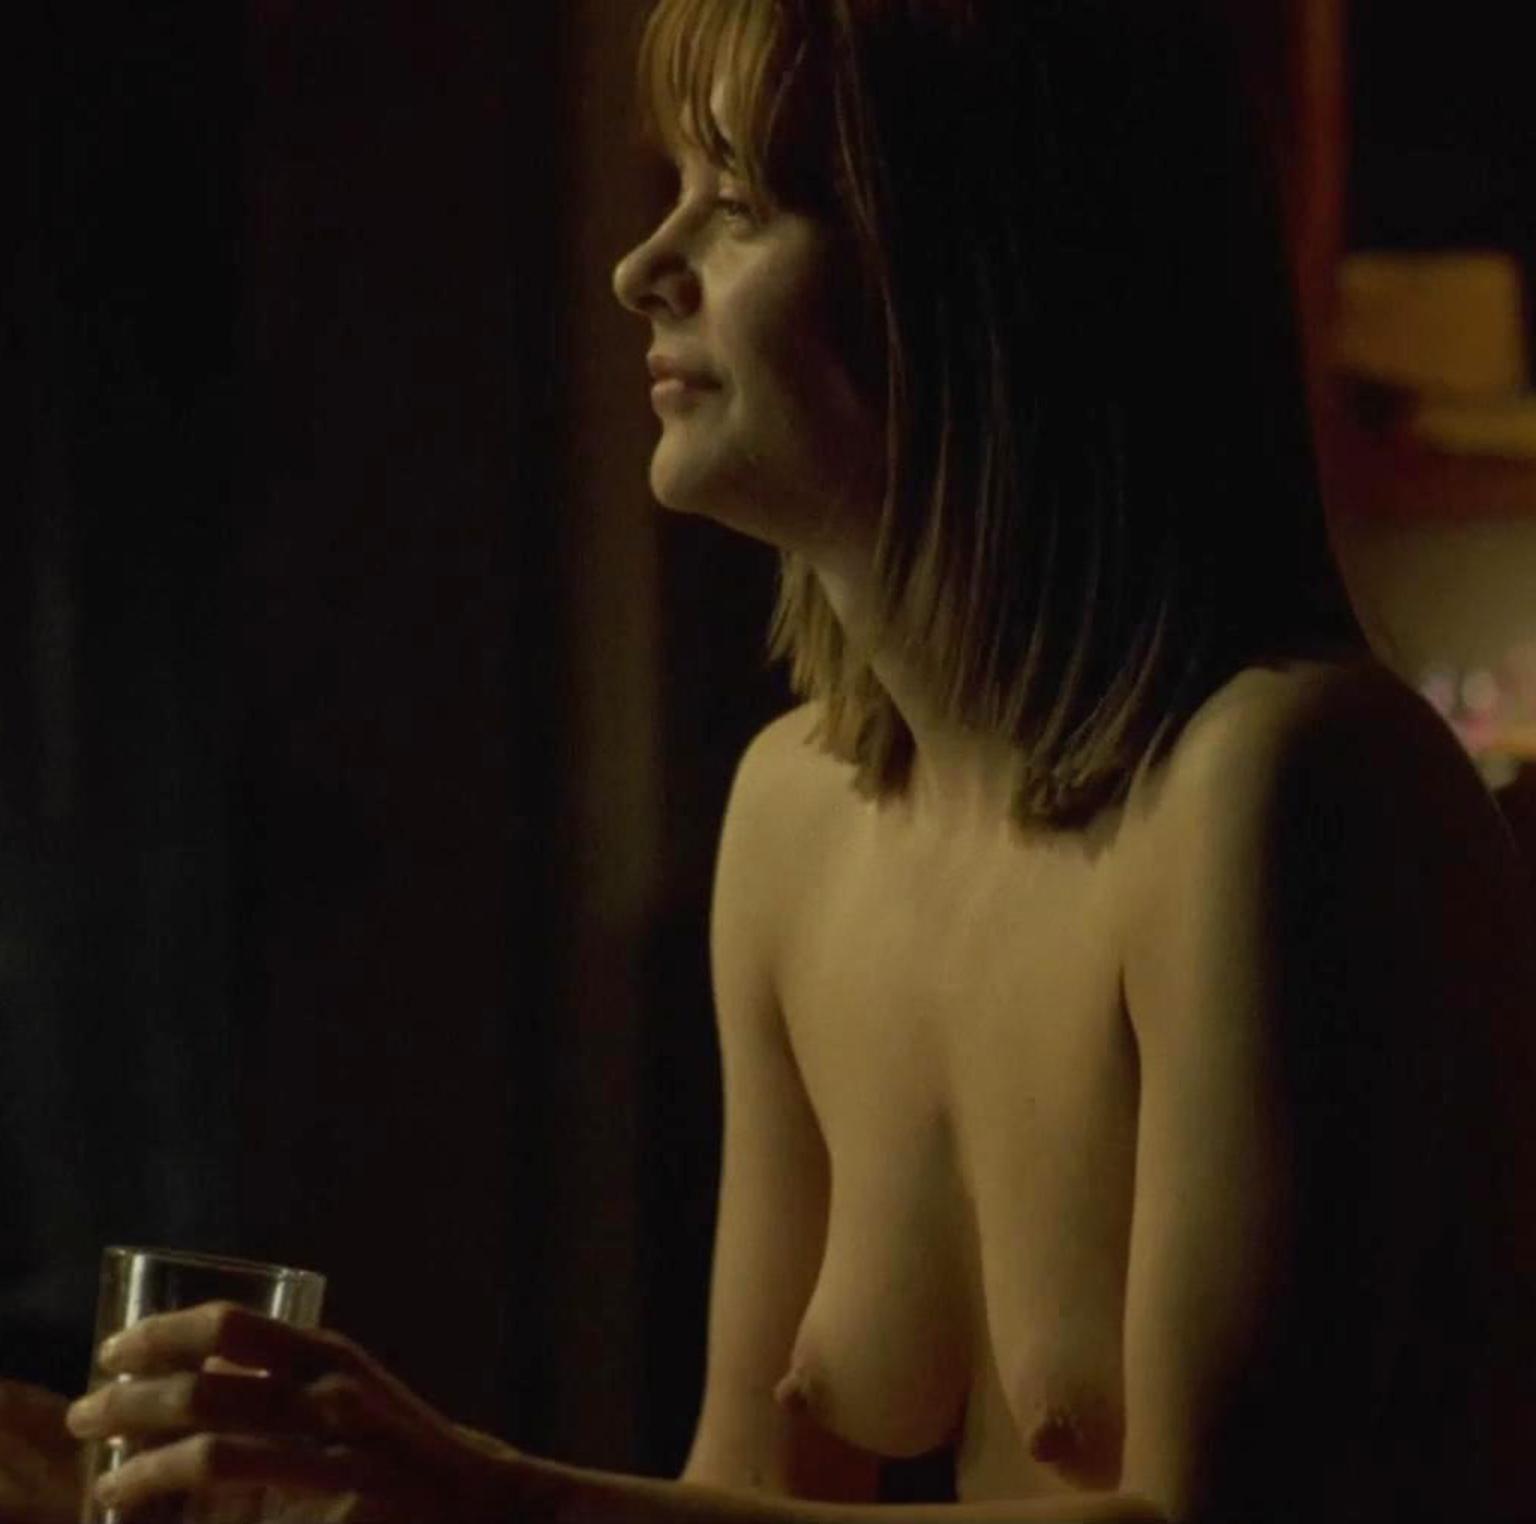 meg-ryan-pussy-getting-fucked-mudd-life-nude